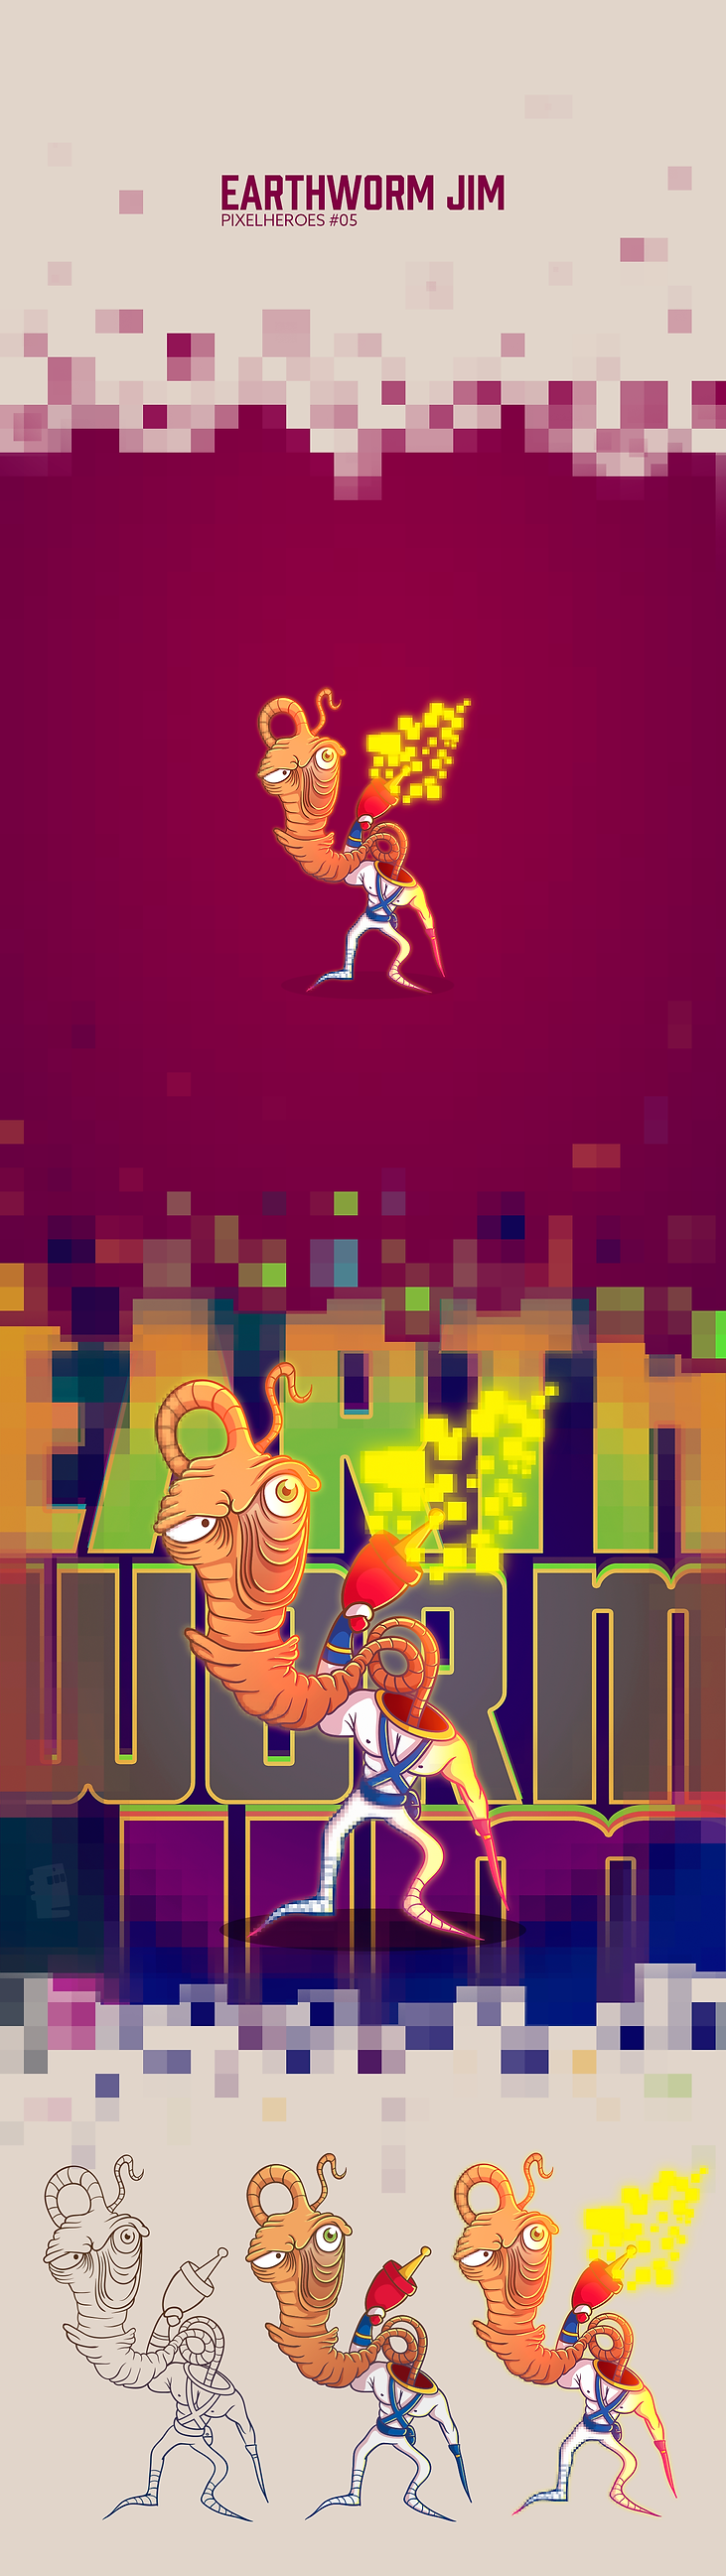 Behance---Pixelheroes-#05---Earthworm-Ji